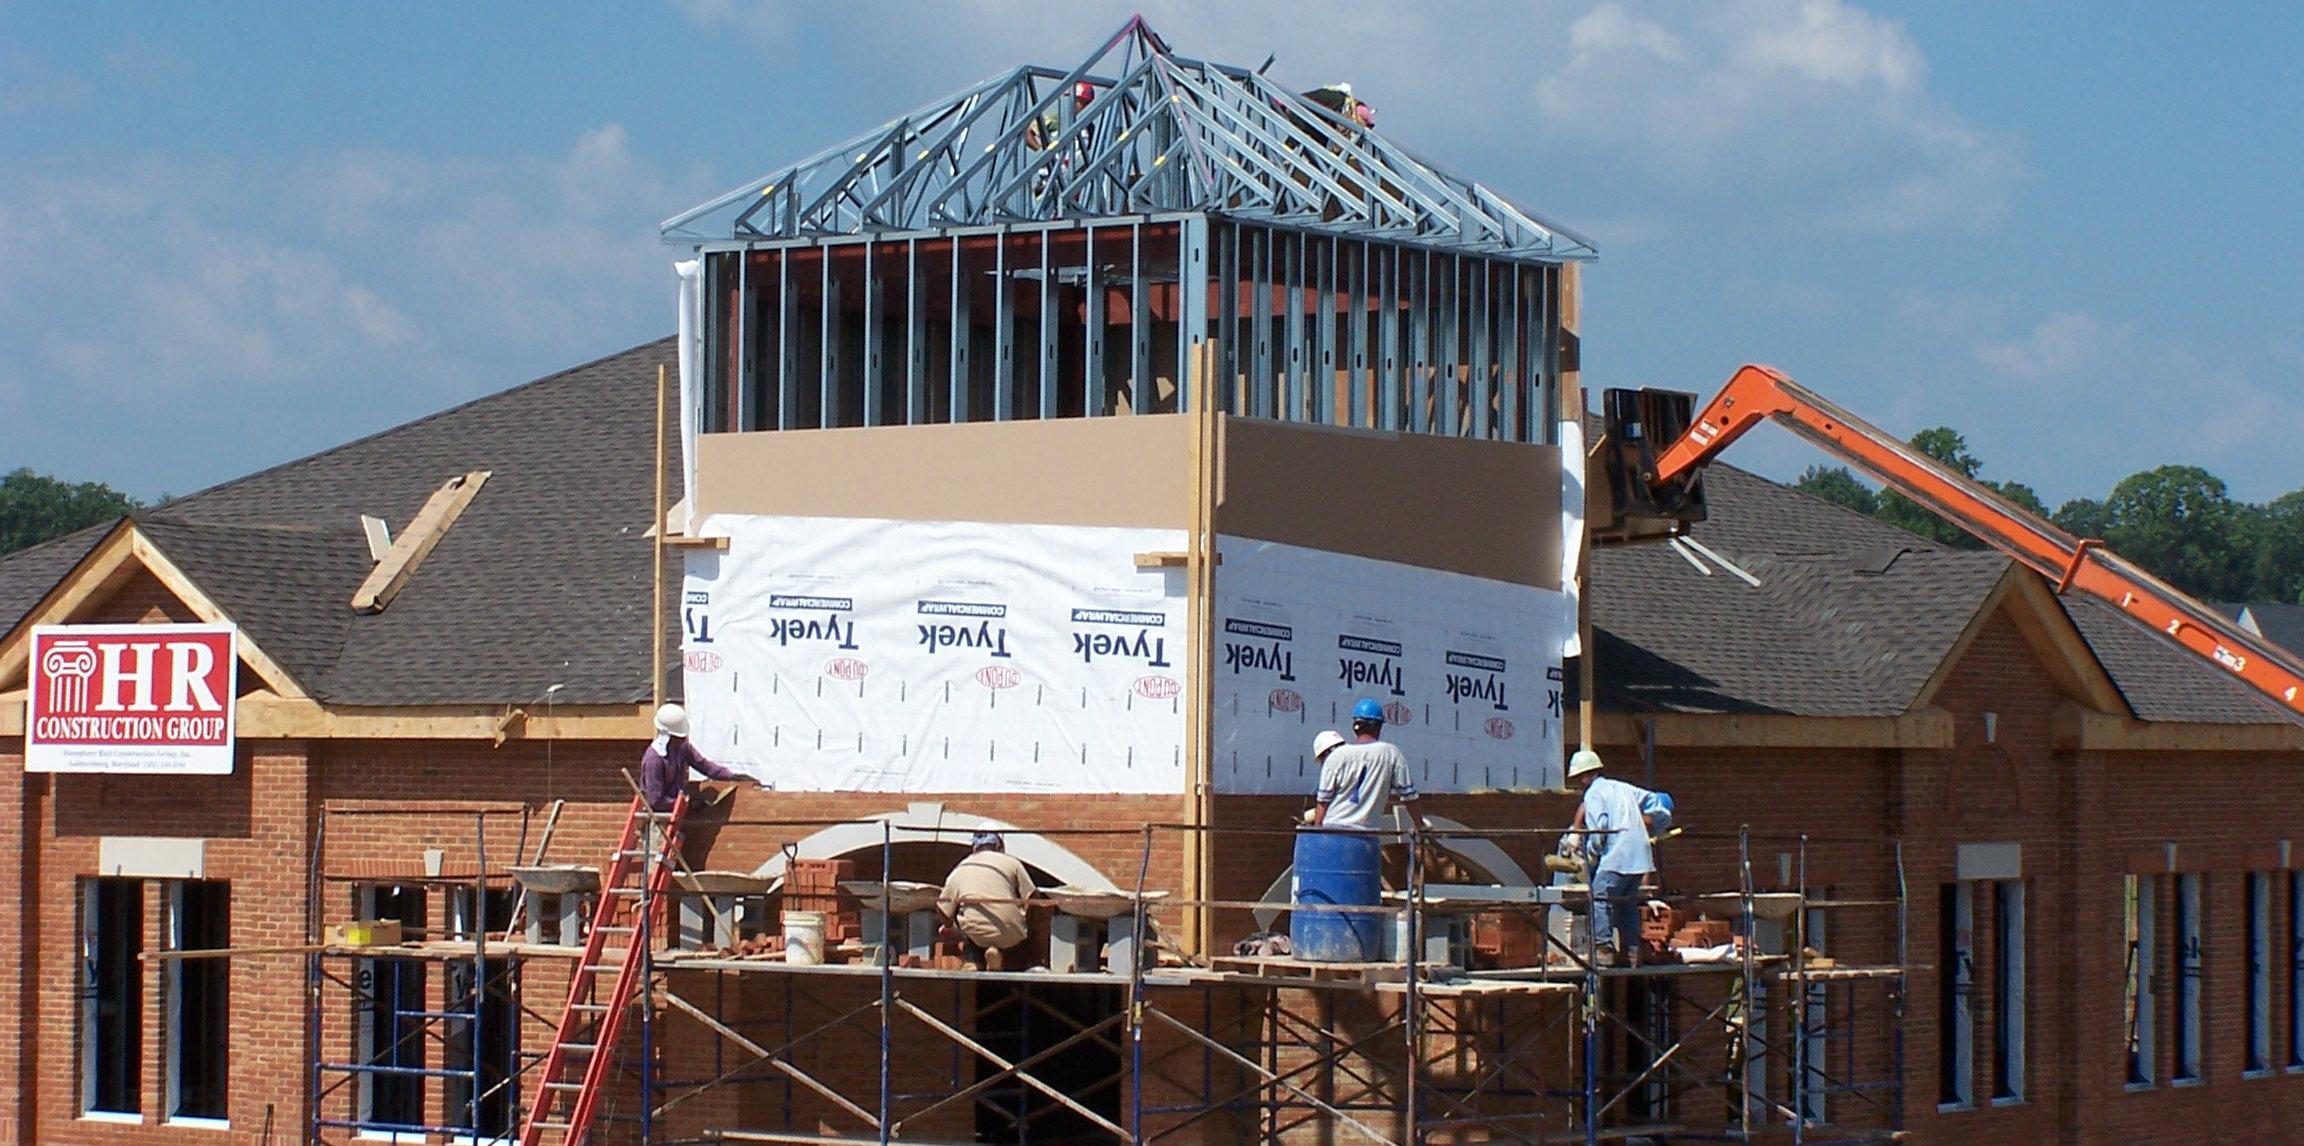 Suntrust Bank exterior renovation